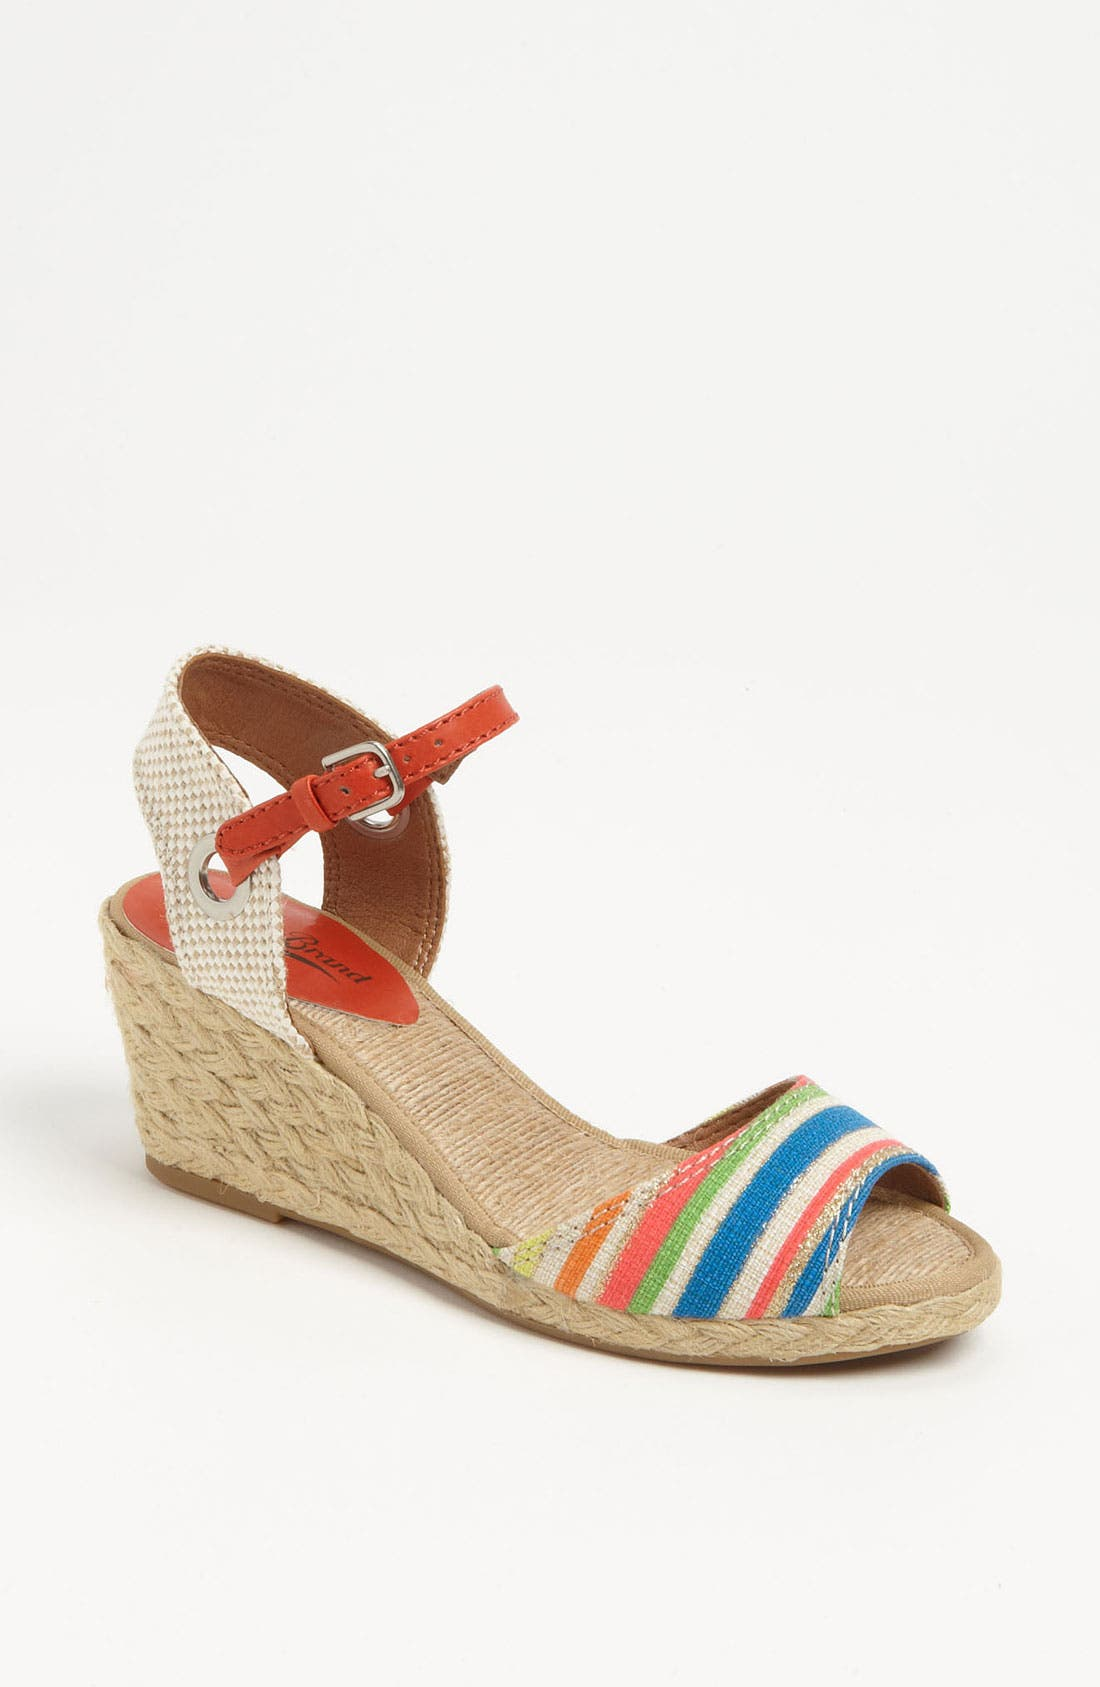 Alternate Image 1 Selected - Lucky Brand 'Kyndra' Sandal